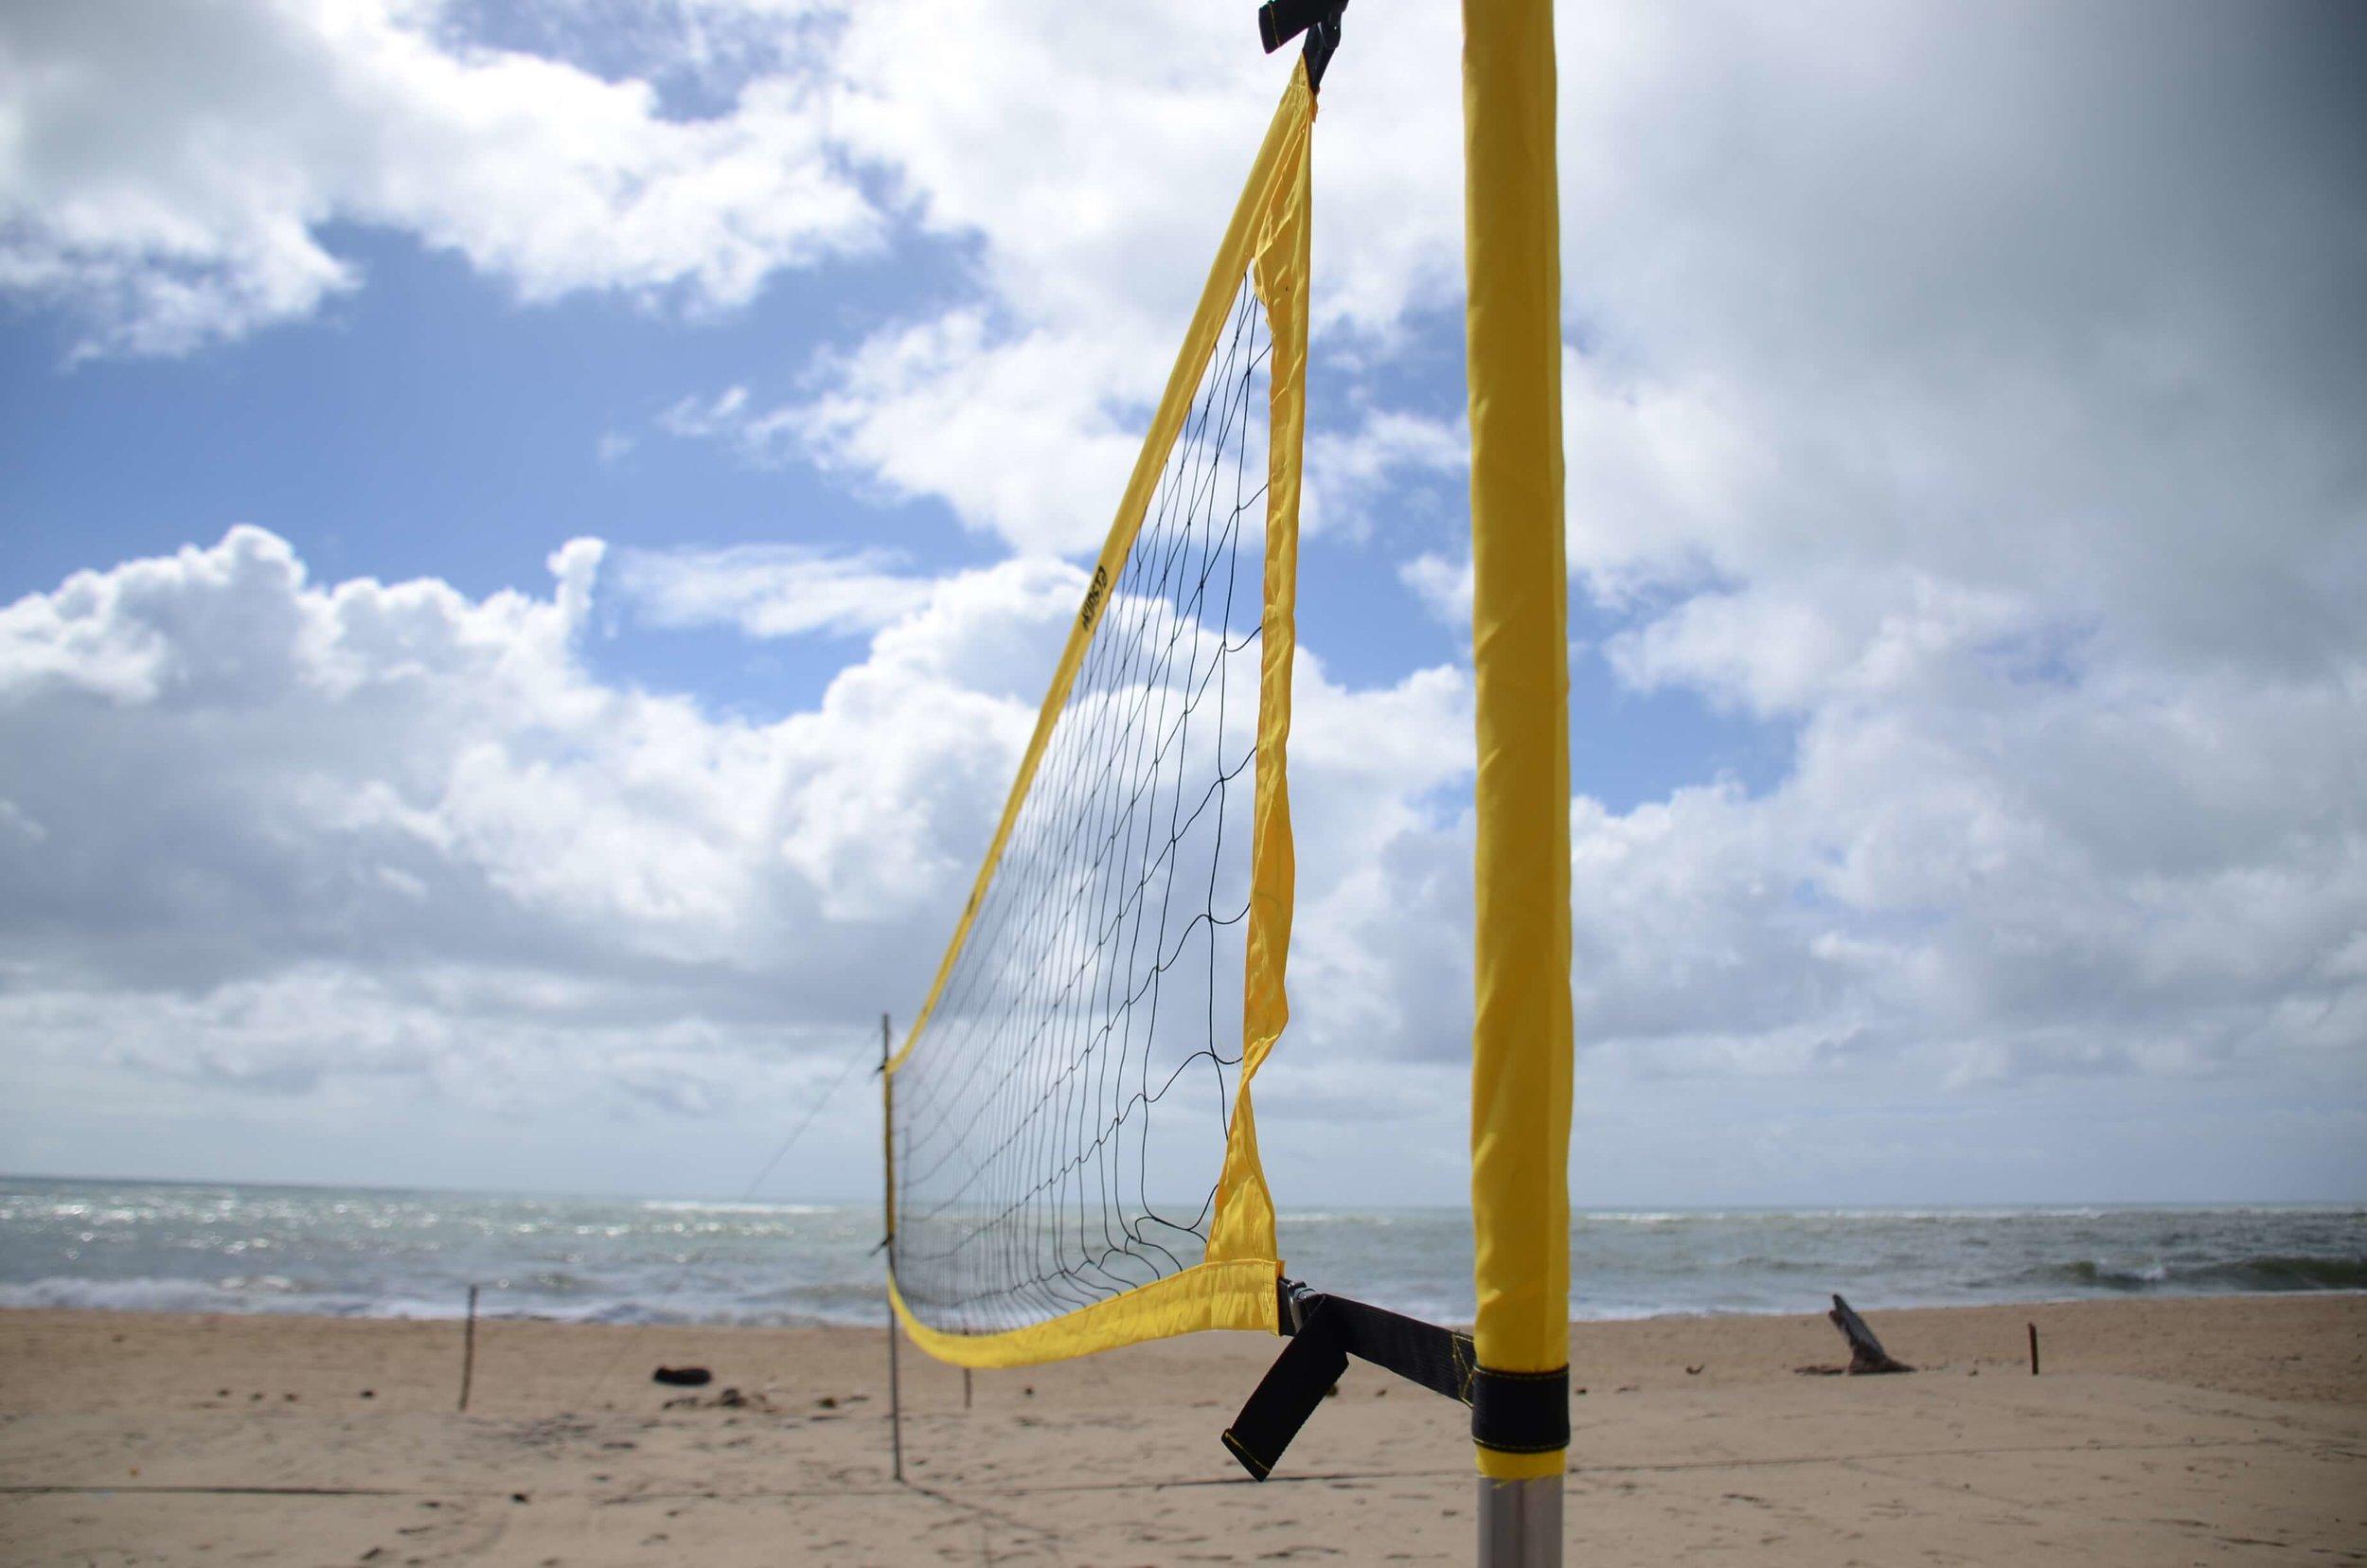 Beachfront volleyball courts for all to enjoy Credit: Lems Andriamihaja/UN-Habitat